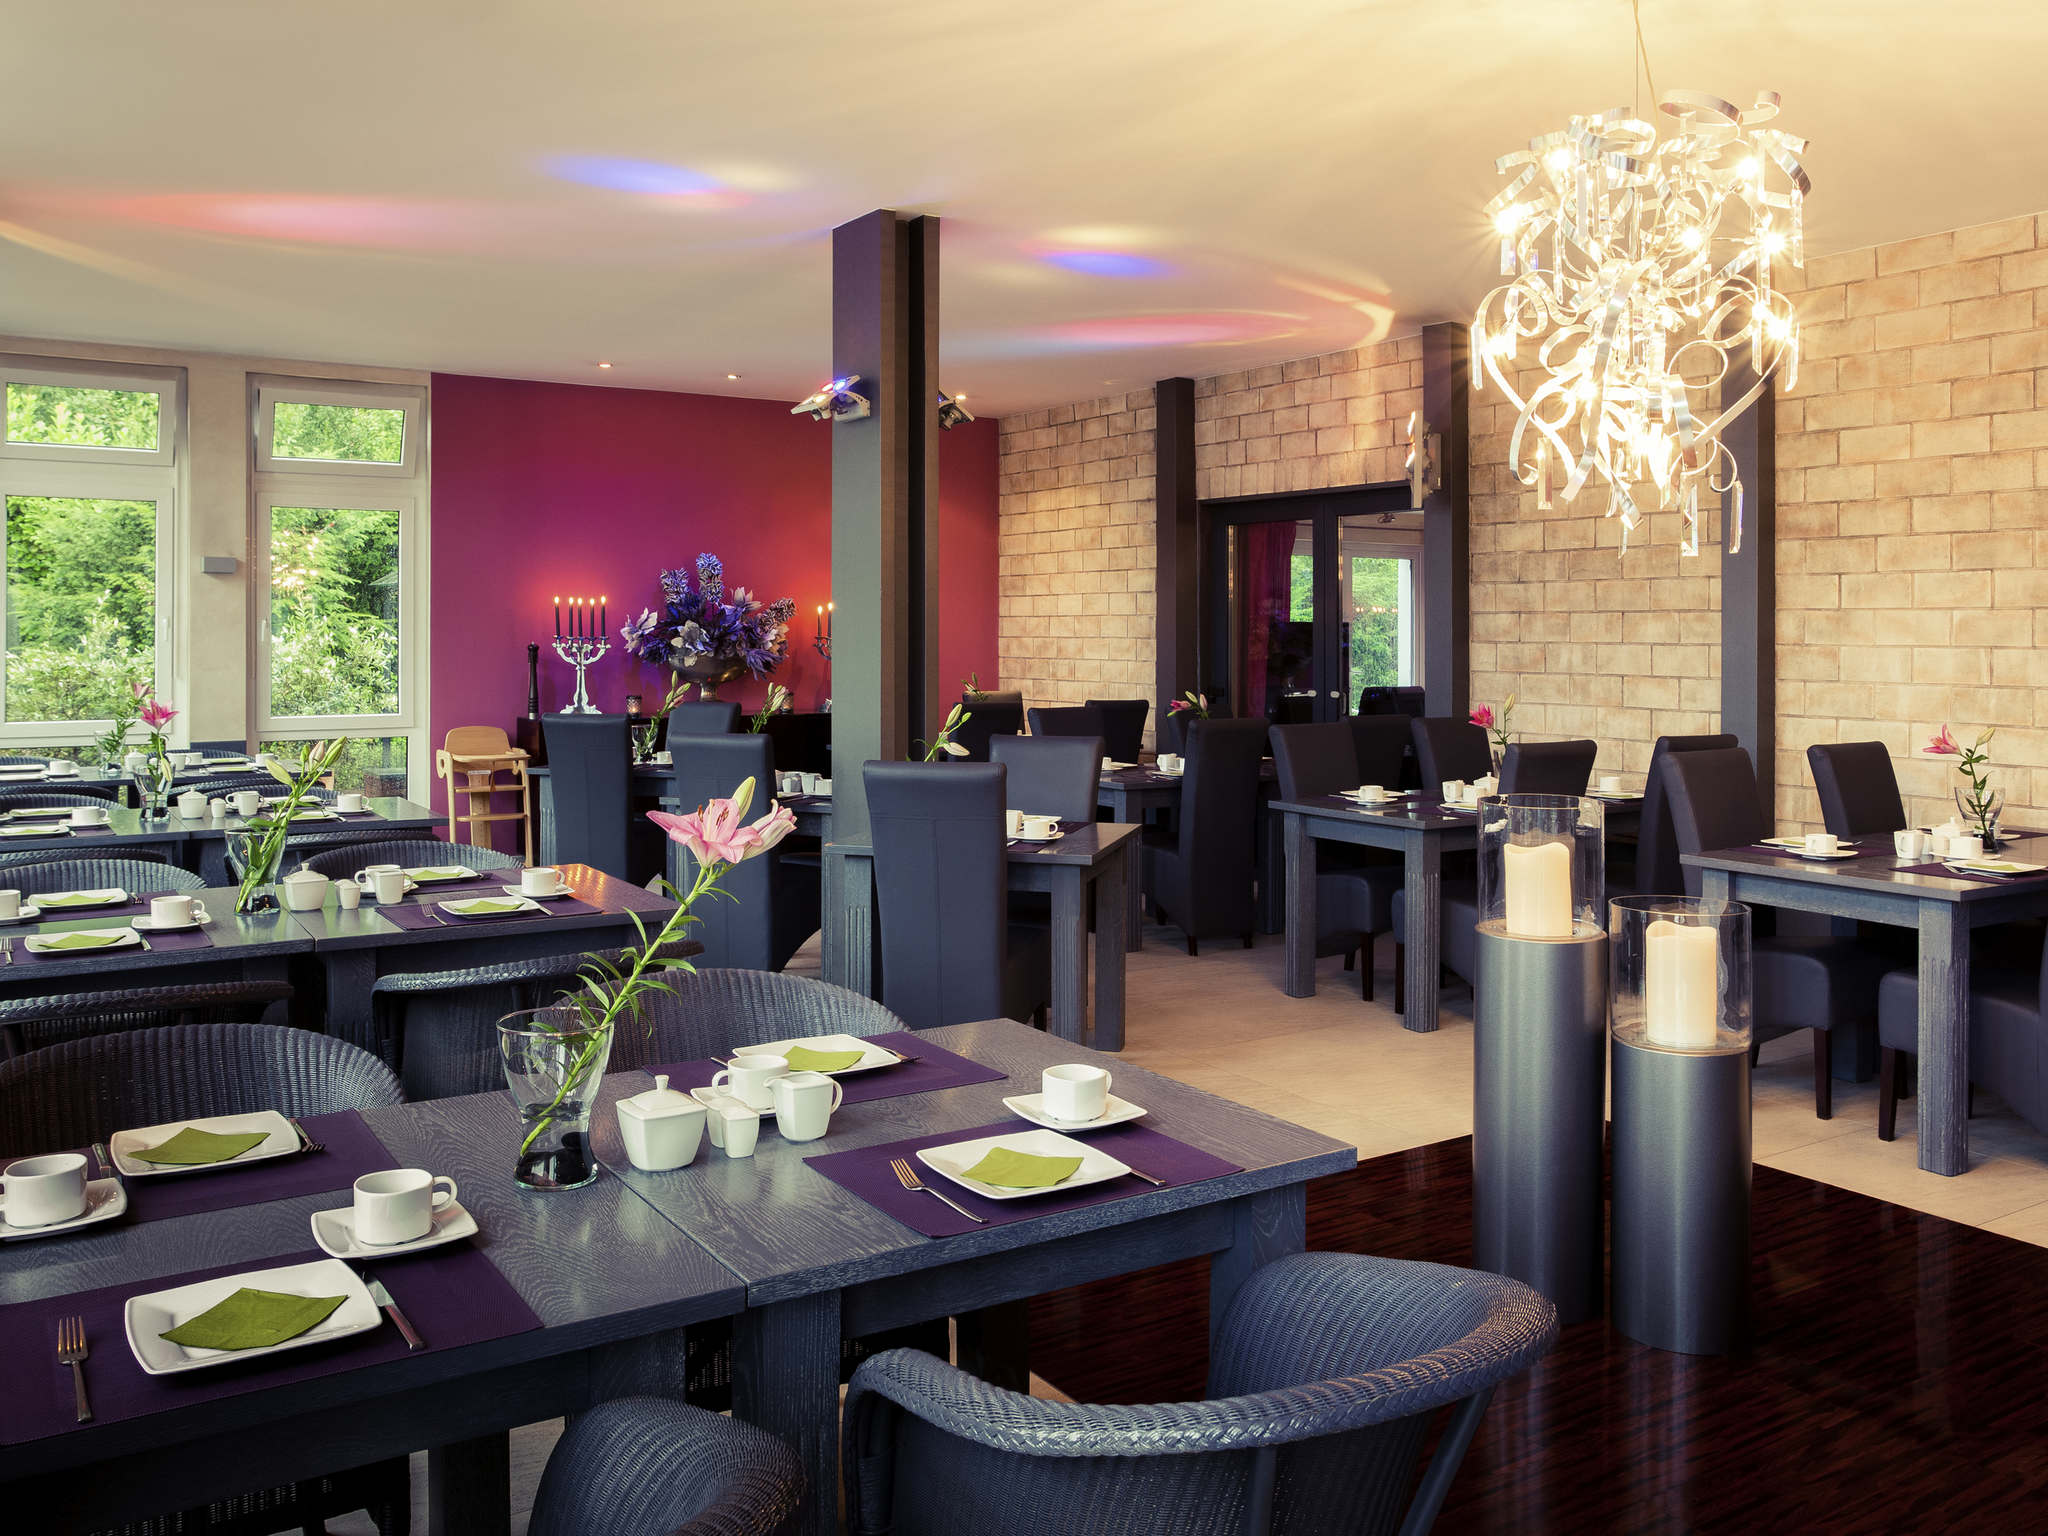 hotel in oberhausen mercure hotel am centro oberhausen. Black Bedroom Furniture Sets. Home Design Ideas